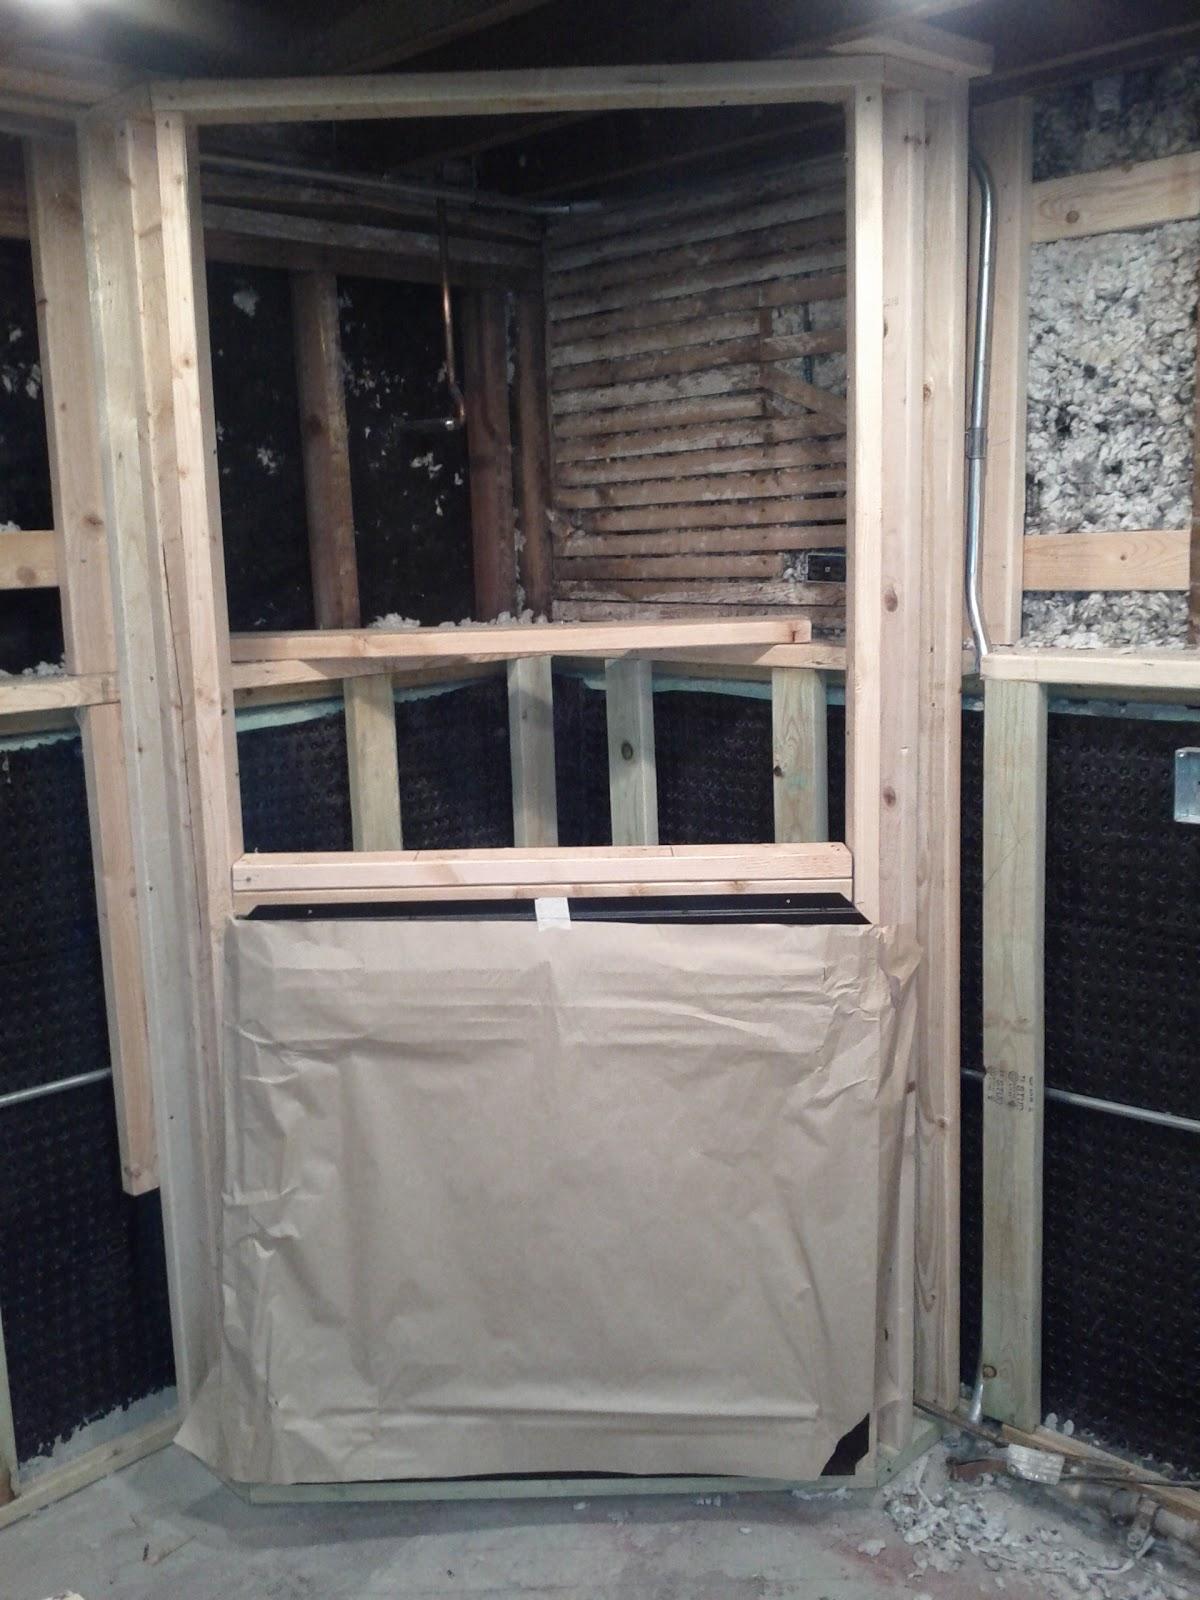 Basement Fireplace Framed In